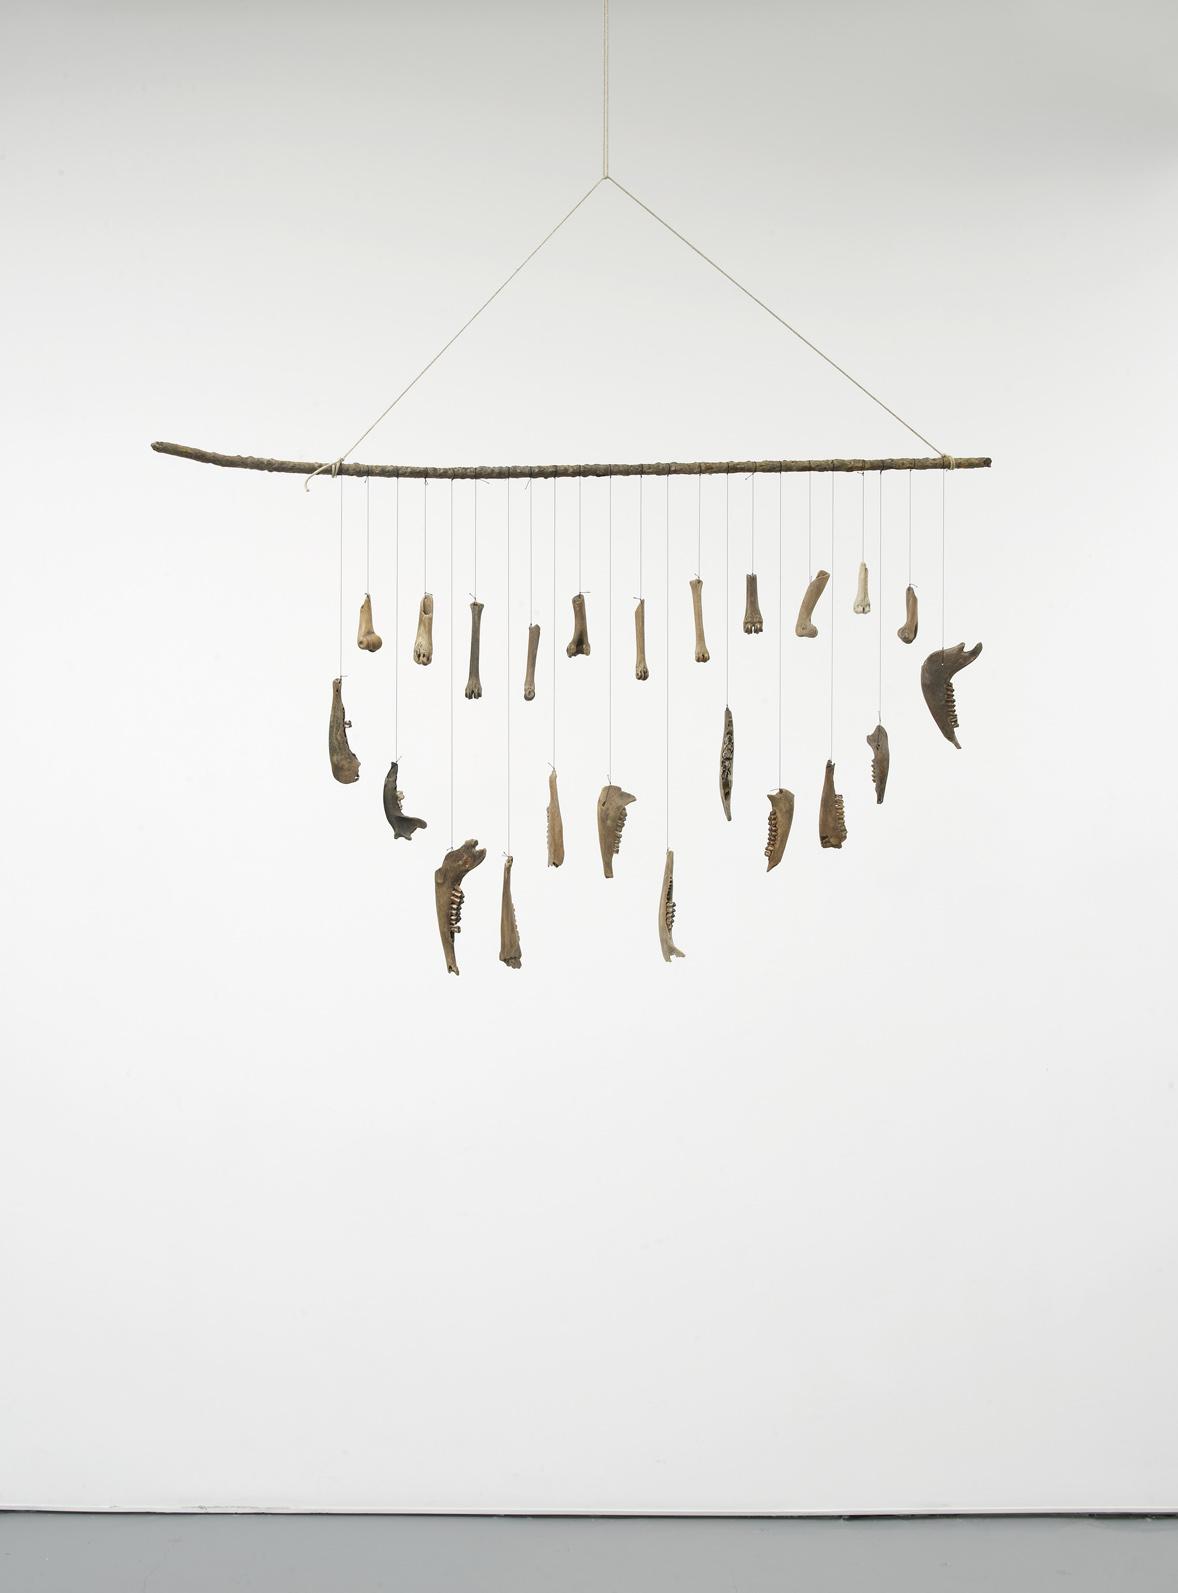 Franziska Lantz THAMES, no title 2016 Metal, bones, rope, string 69 x 113 x 8 cm / 27.1 x 44.4 x 3.1 in HS12-FL5509S